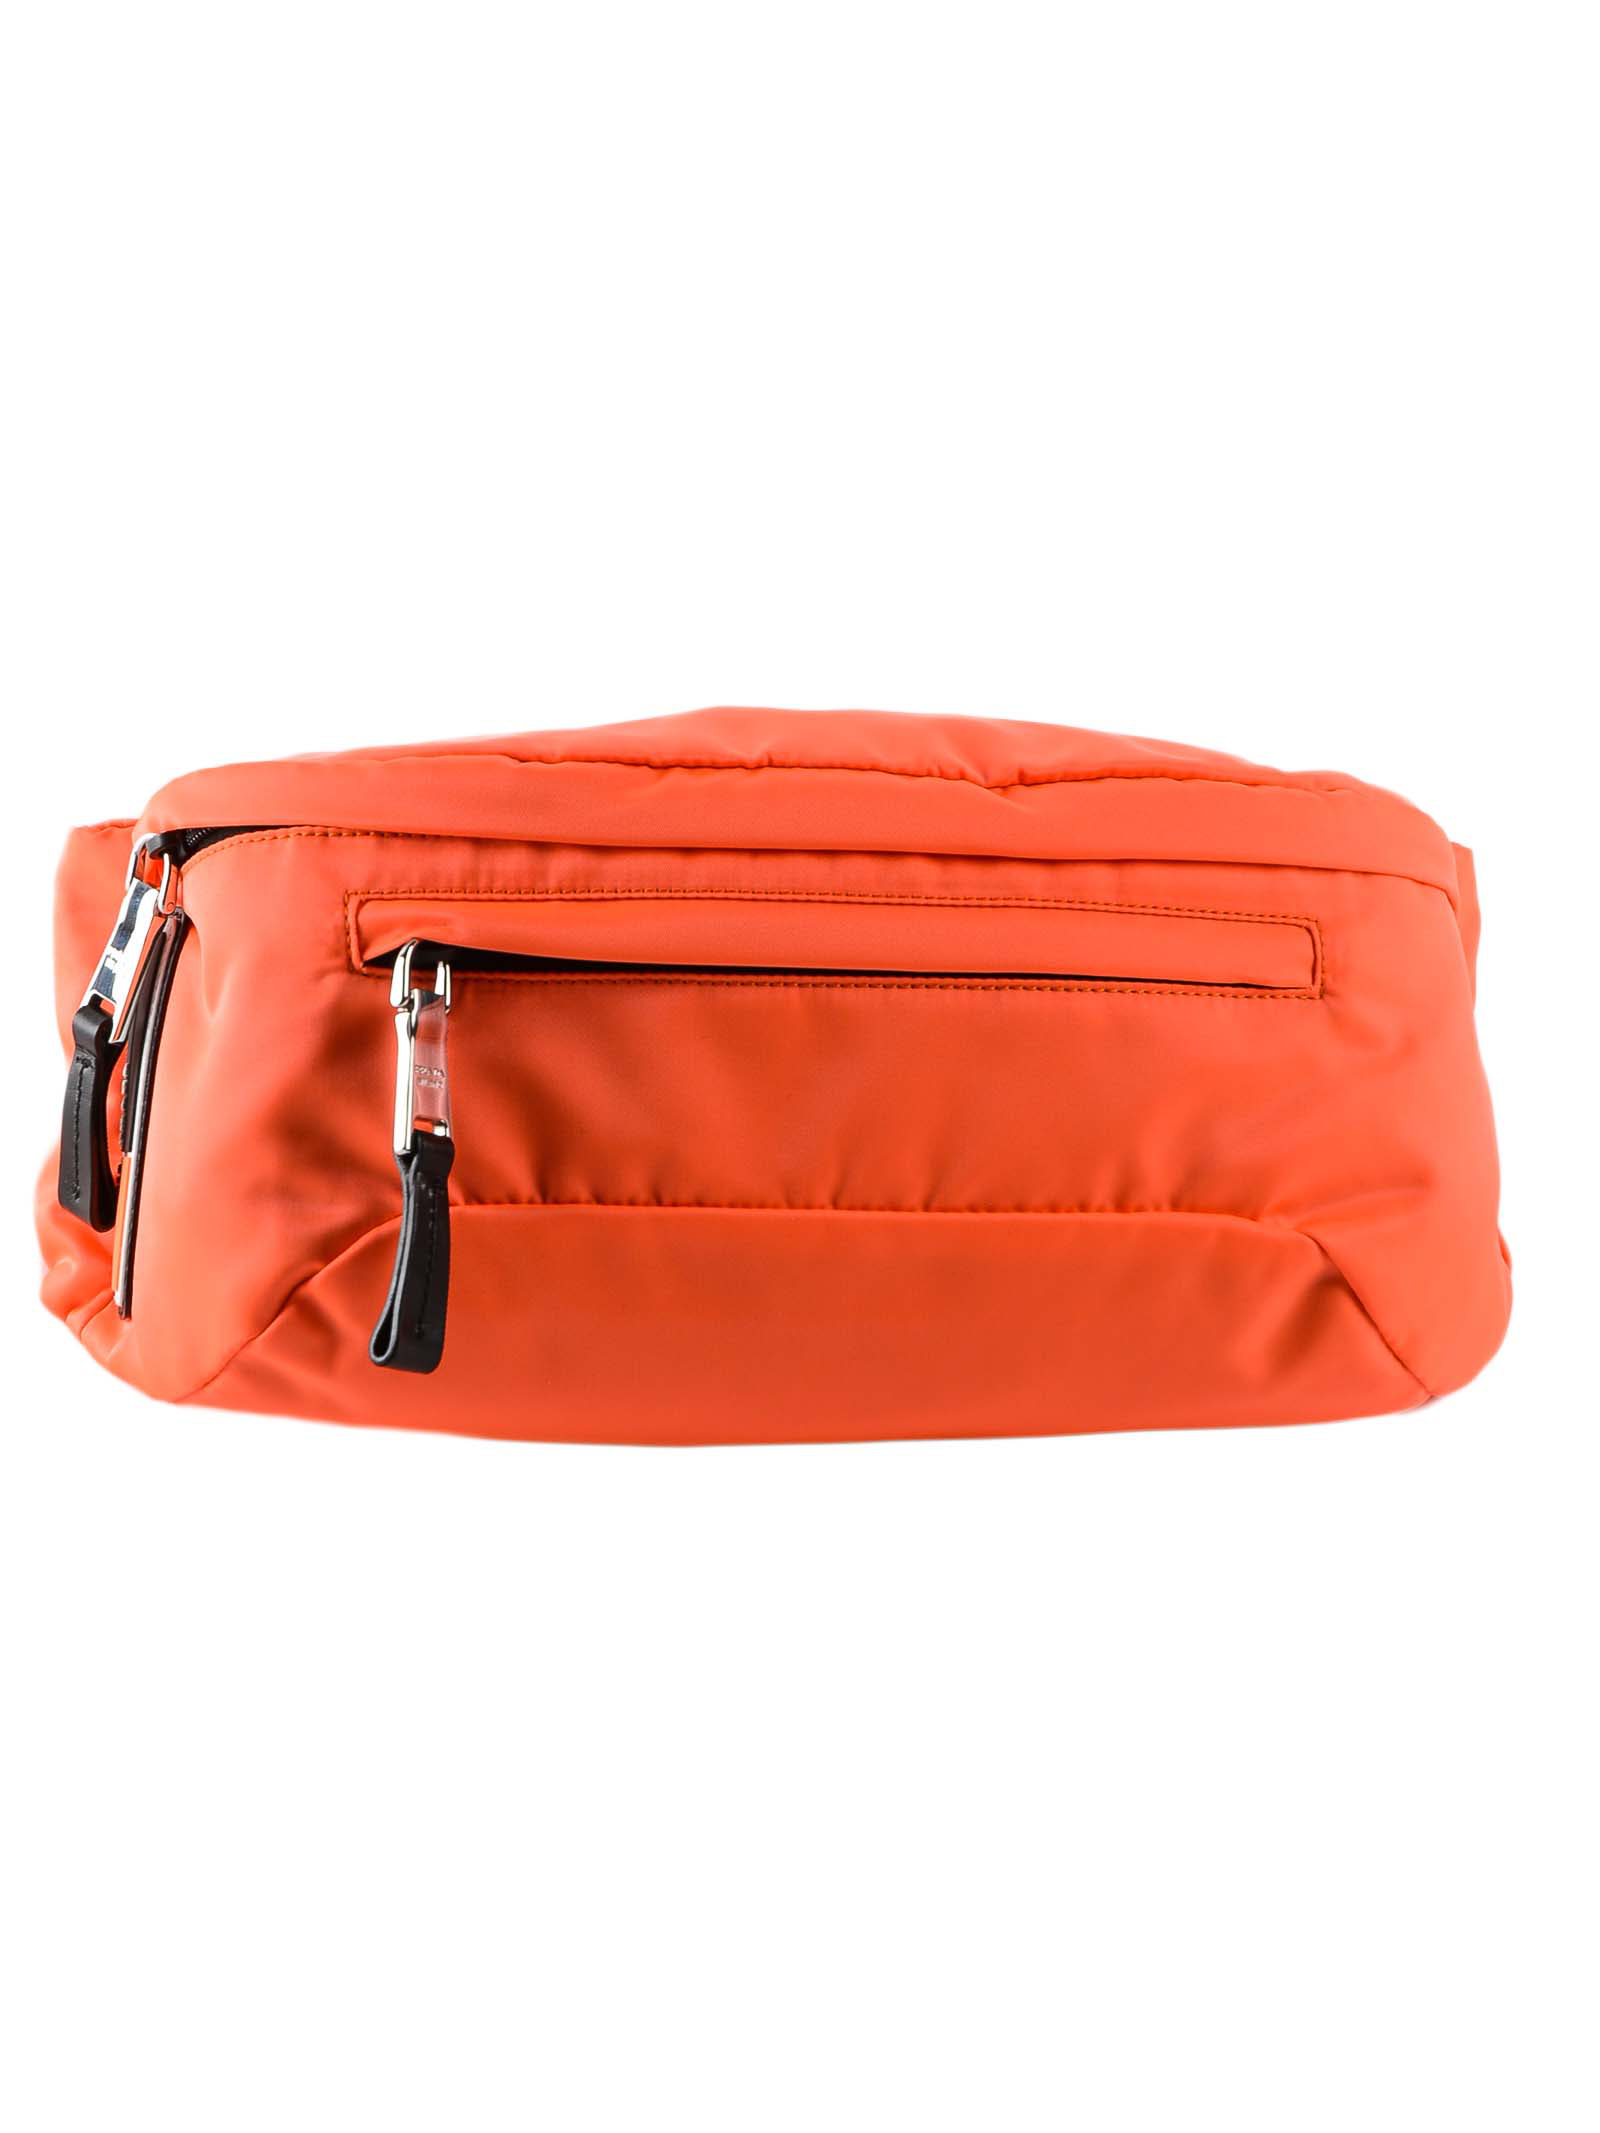 1531fcfa1682ae Prada Classic Belt Bag In Xyb Arancio Fluo/Nero   ModeSens